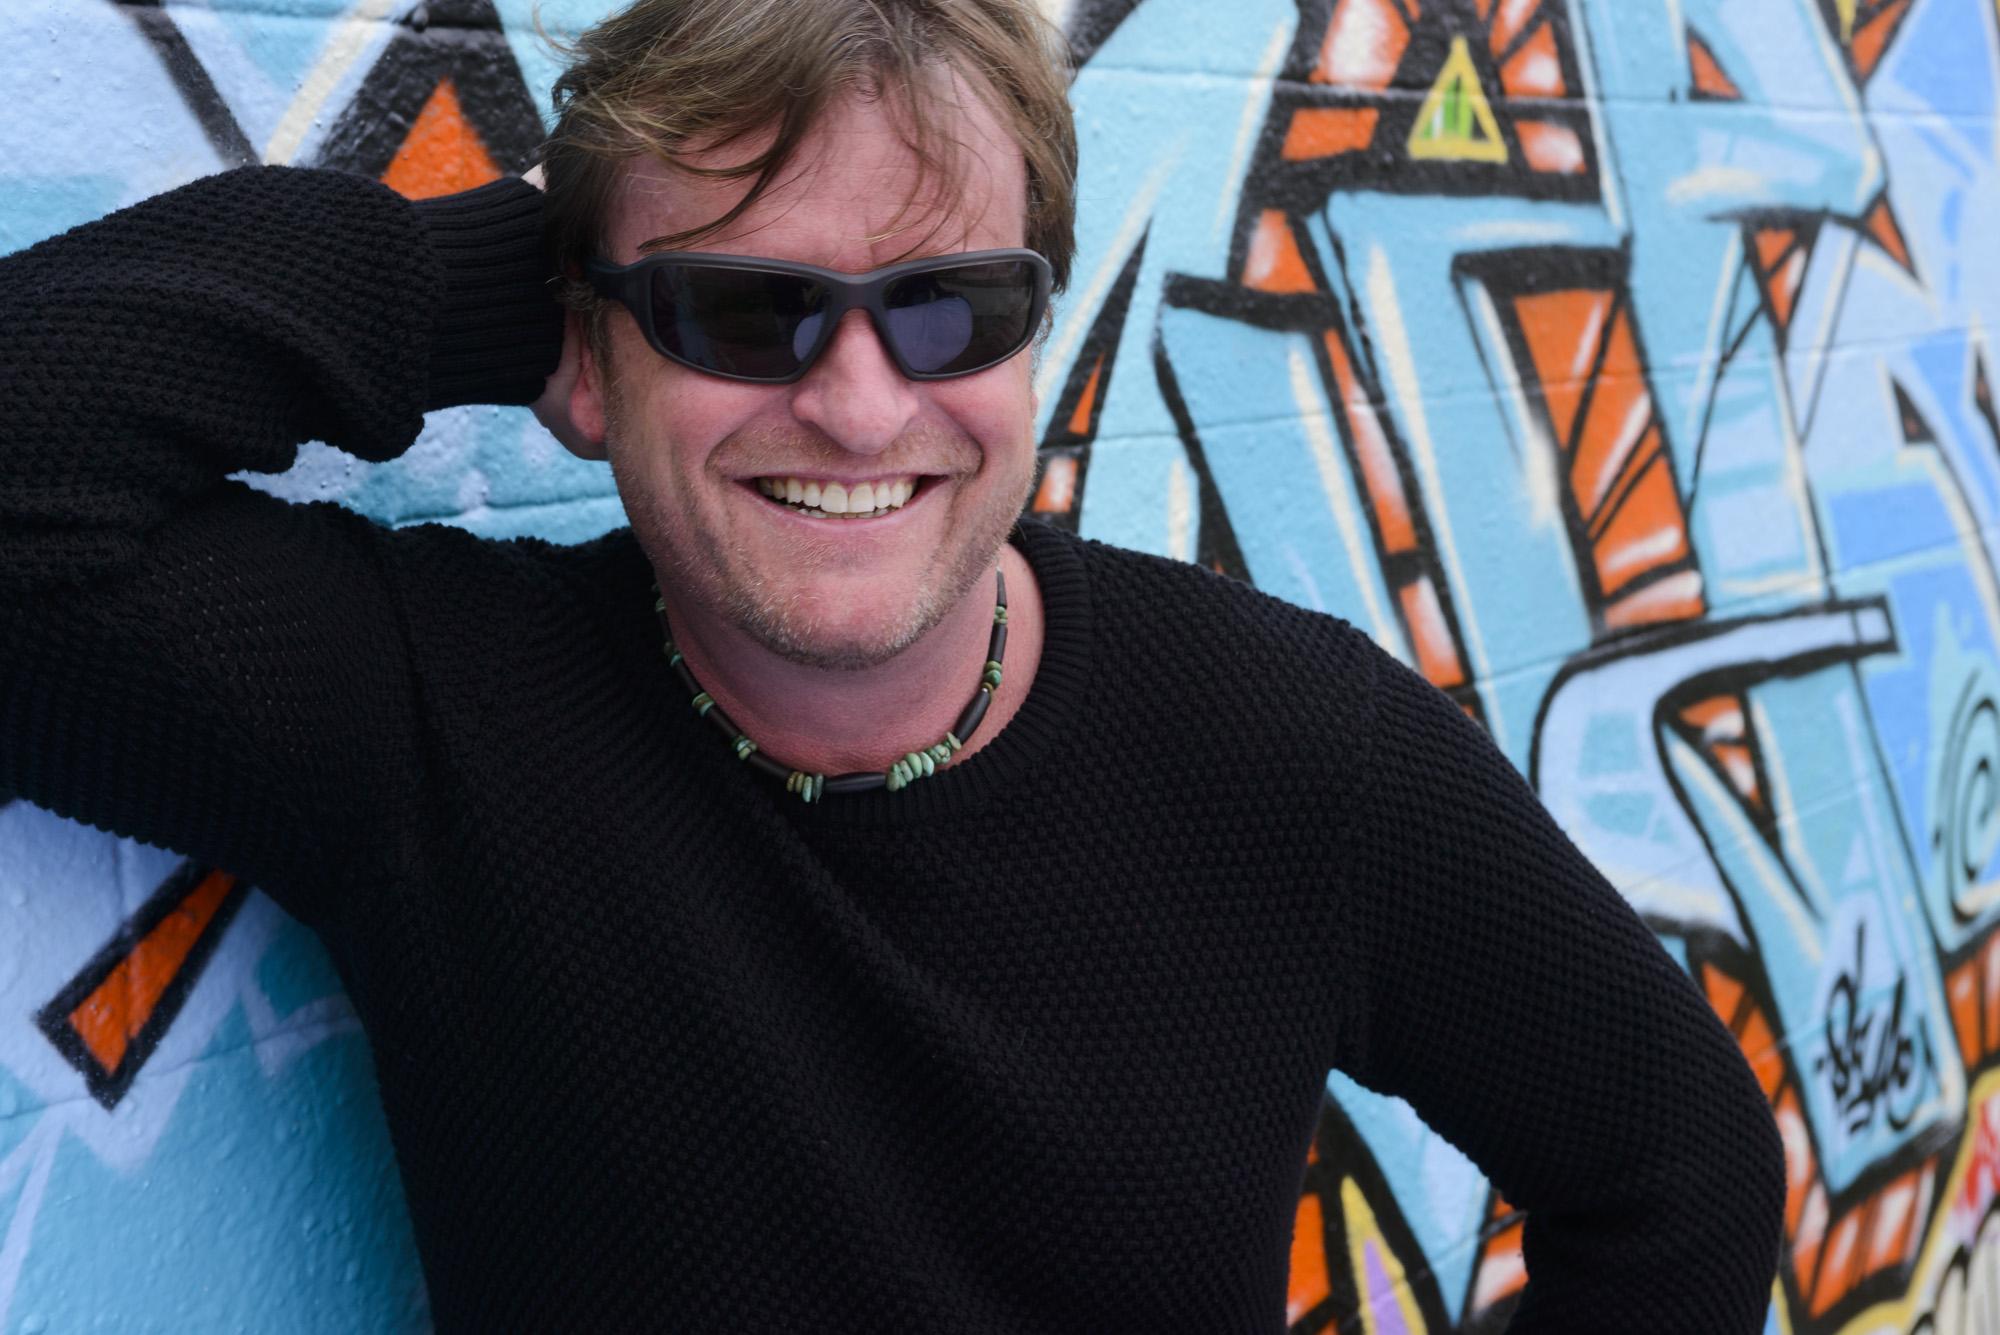 Winemaker Adam LaZarre of Cycles Gladiator. Courtesy of Ken Hanson.